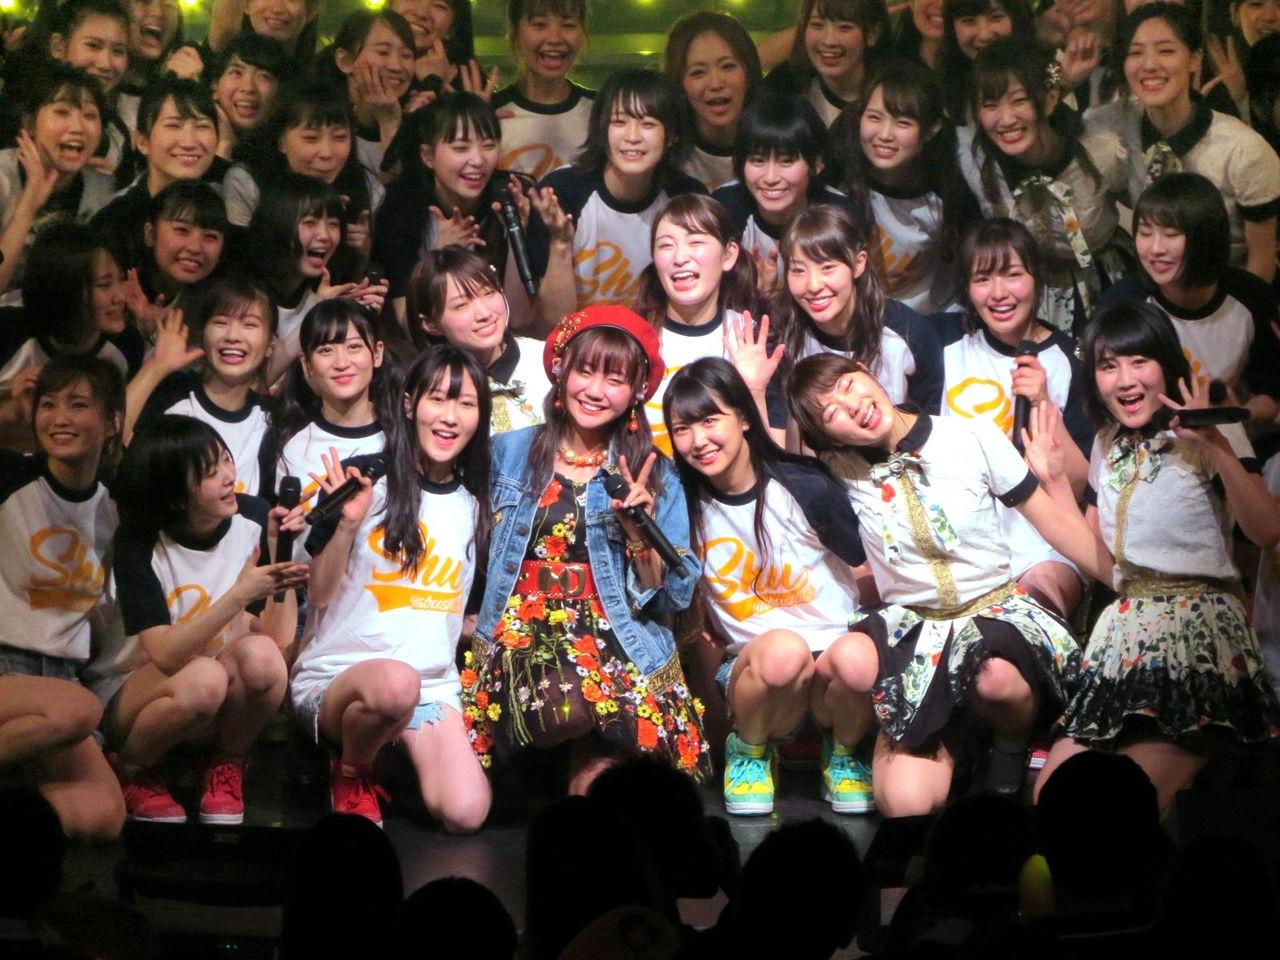 【NMB48薮下柊卒業コンサート】YNN卒業メッセージにスペシャルゲストキタ━━━━(゚∀゚)━━━━!!【公演後のメンバーSNSなどまとめ】